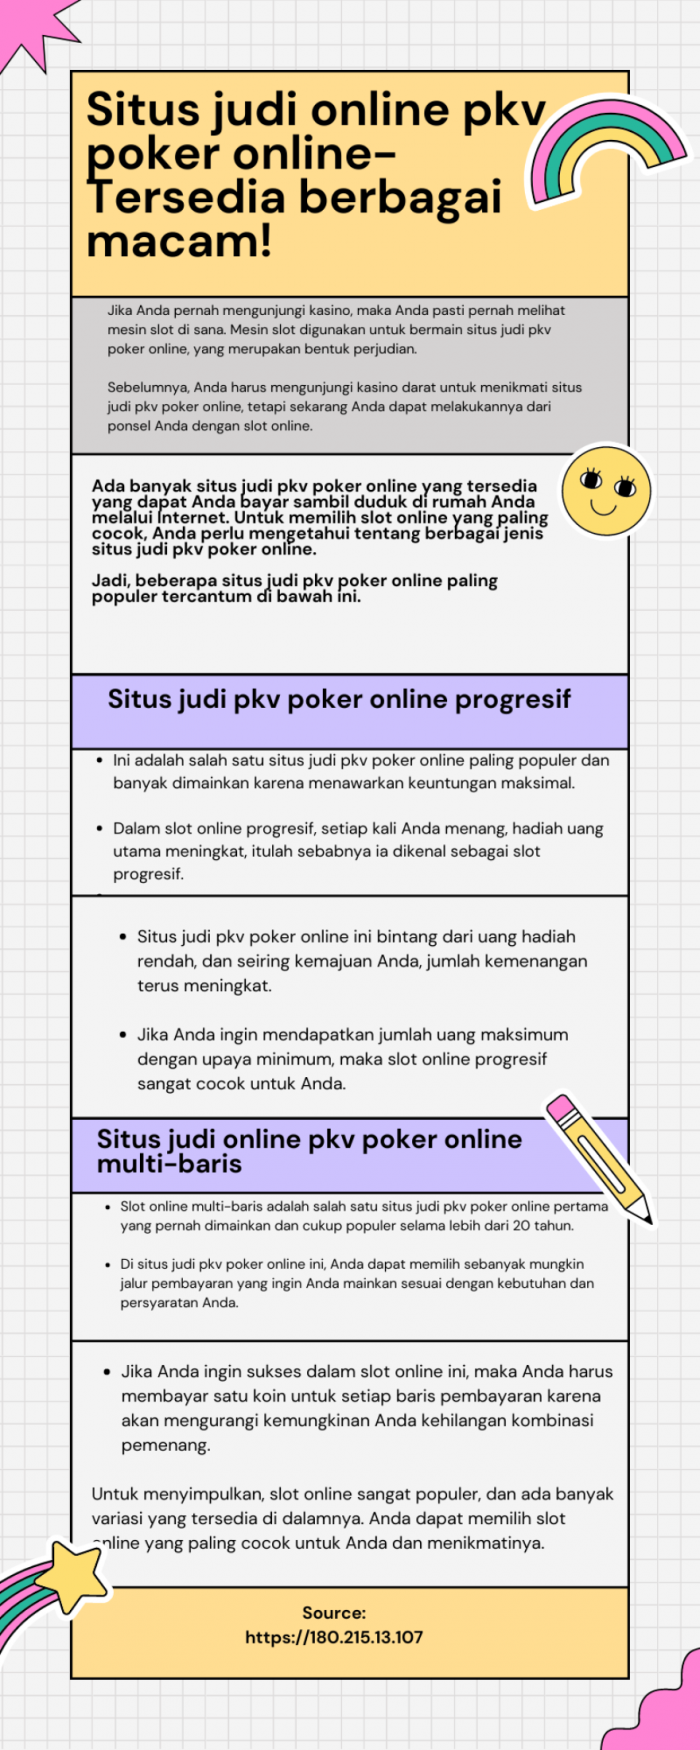 Popular forms of situs judi pkv poker online